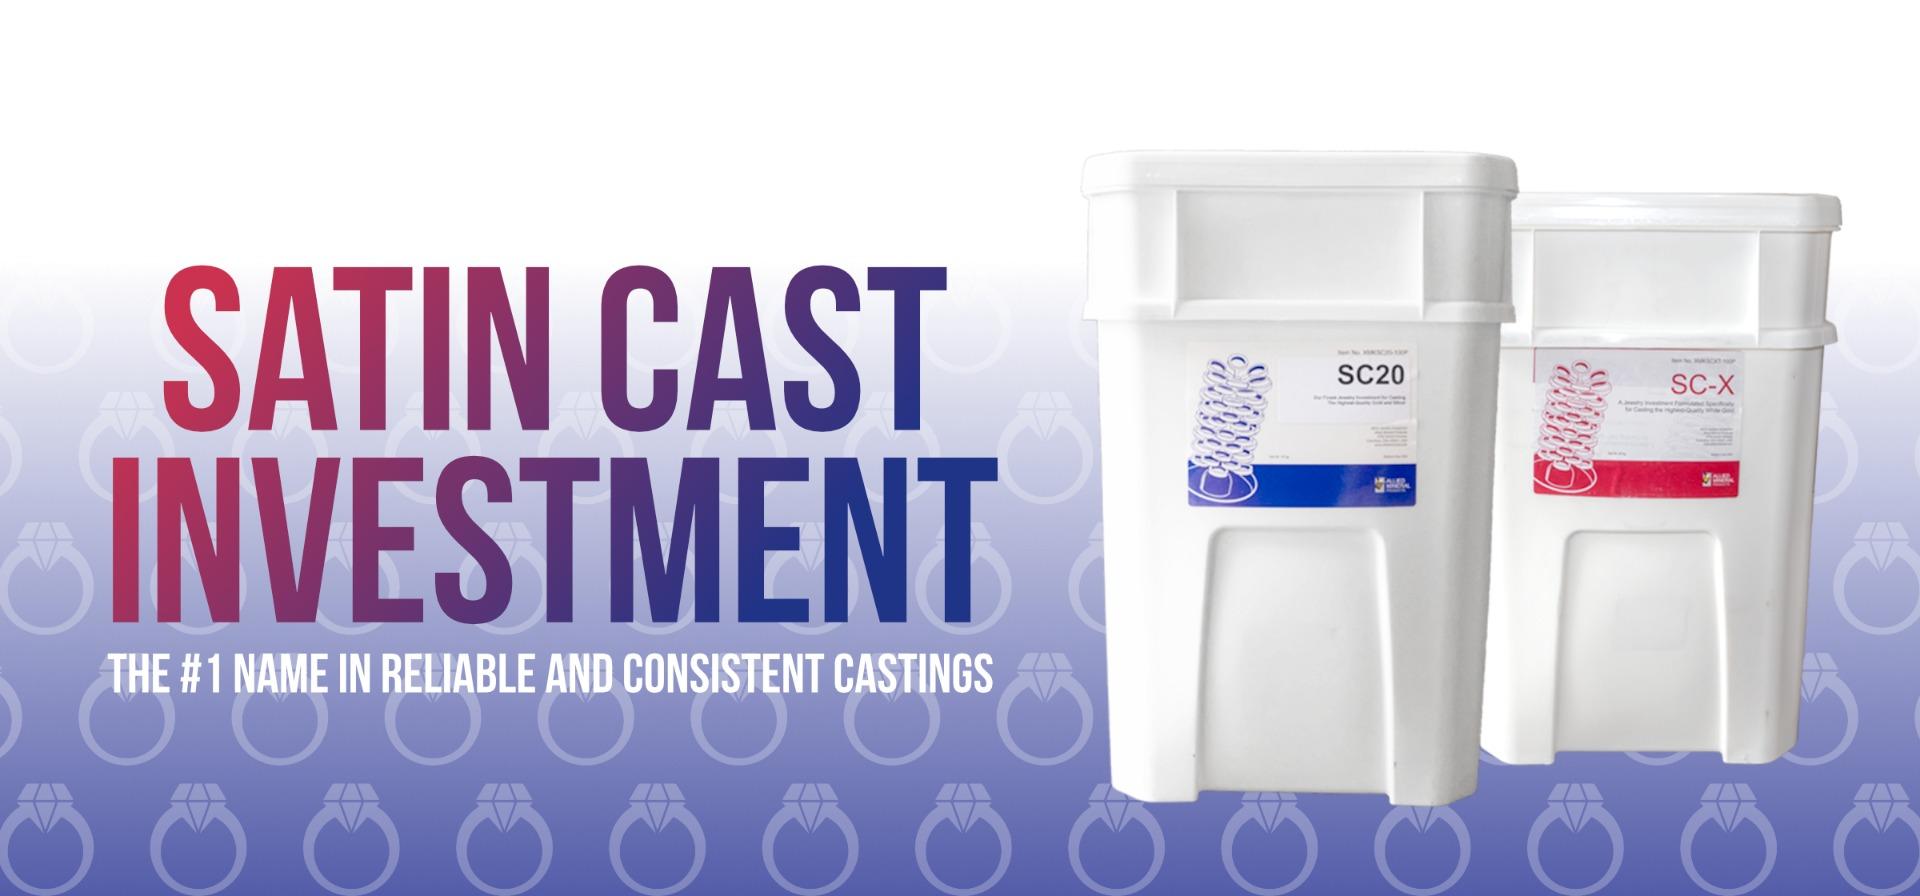 Satin Cast